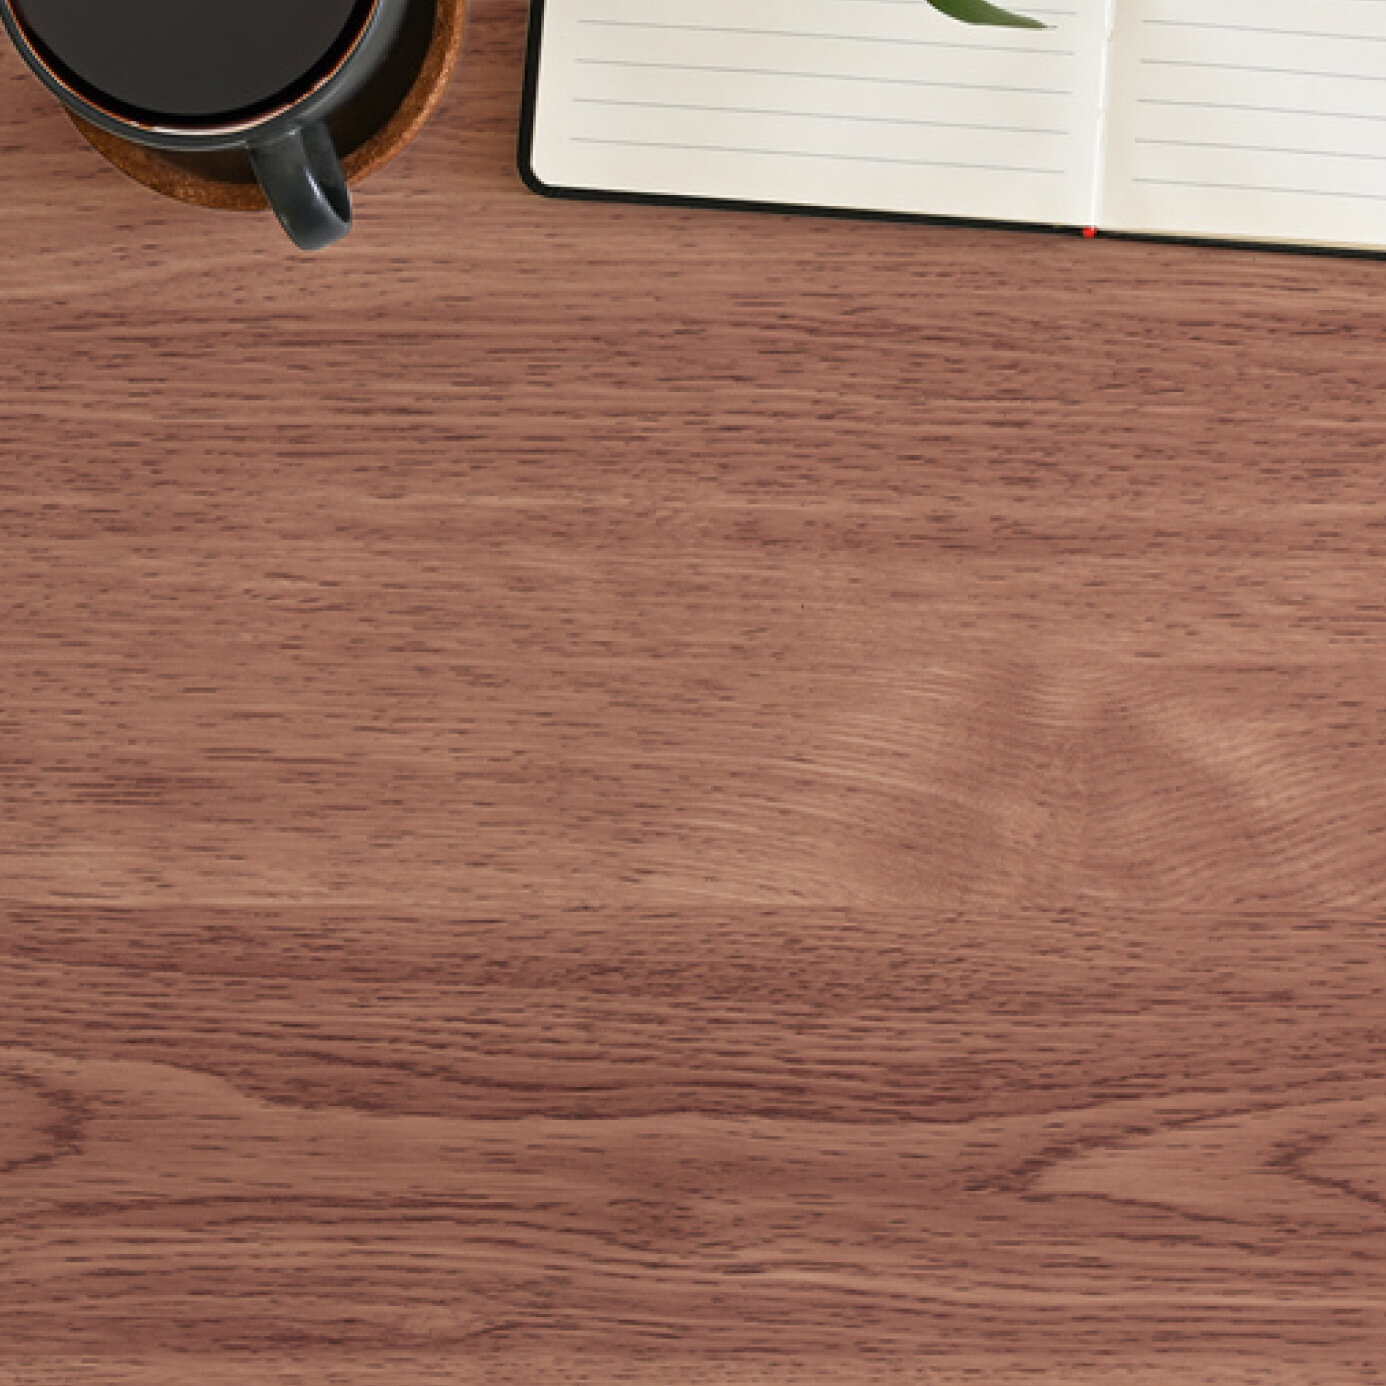 Millwood Pines Adhesive Film Surface Decal Wayfair